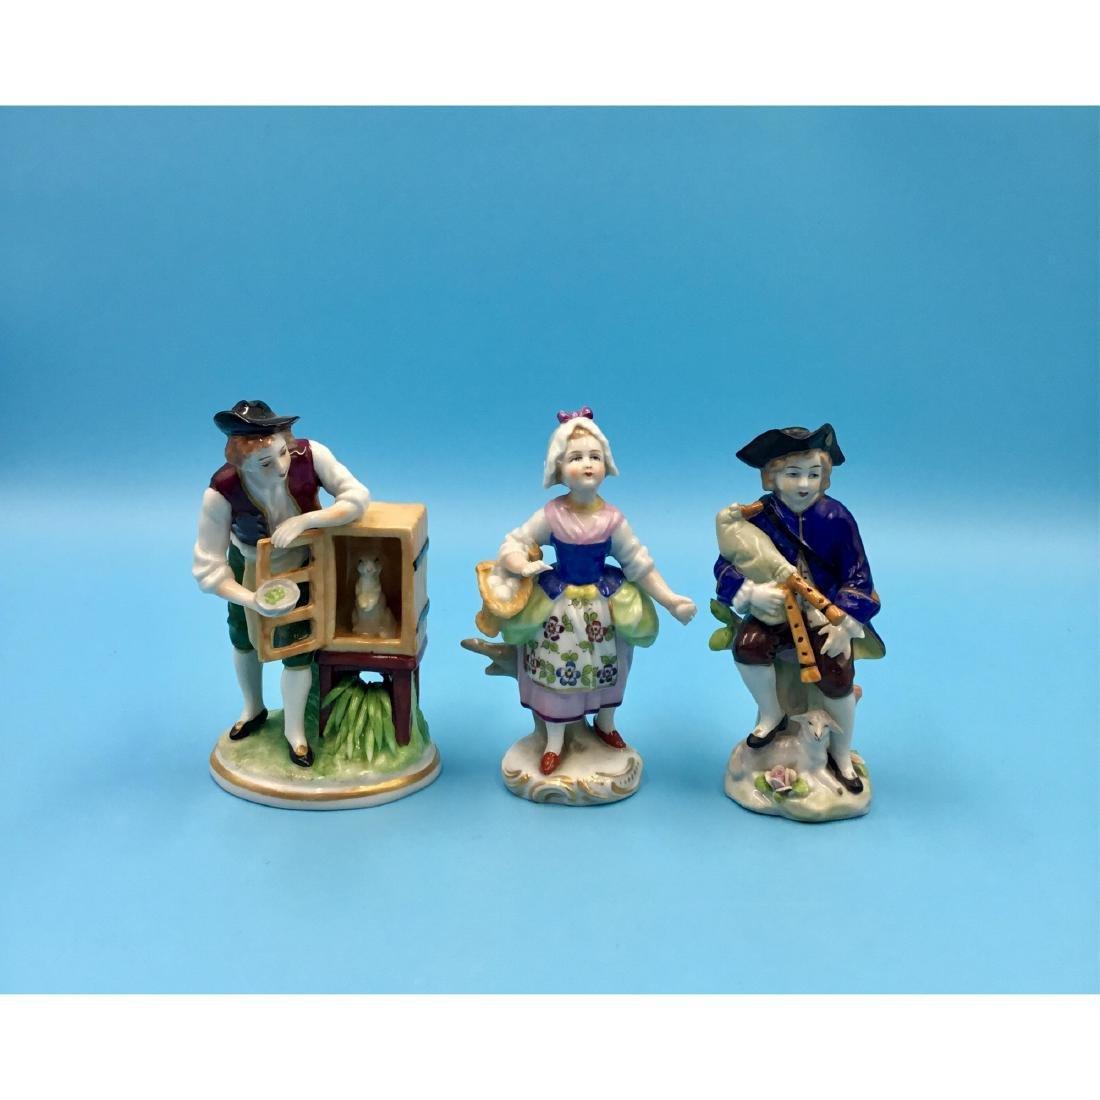 GROUP OF 3 SITZENDORF GERMAN PORCELAIN FIGURINES